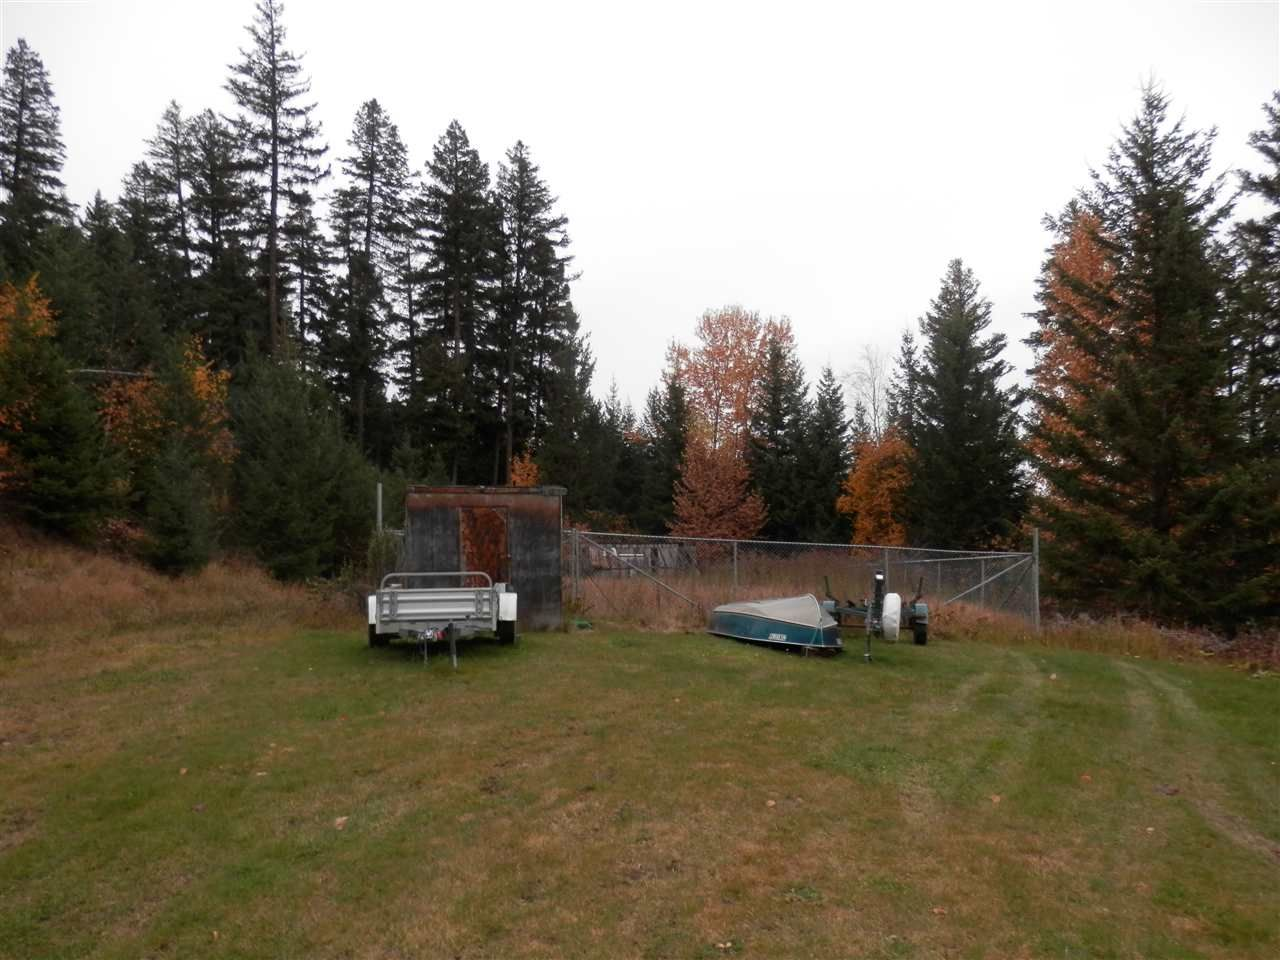 Photo 19: Photos: 935 HODGSON Road in Williams Lake: Esler/Dog Creek House for sale (Williams Lake (Zone 27))  : MLS®# R2414109